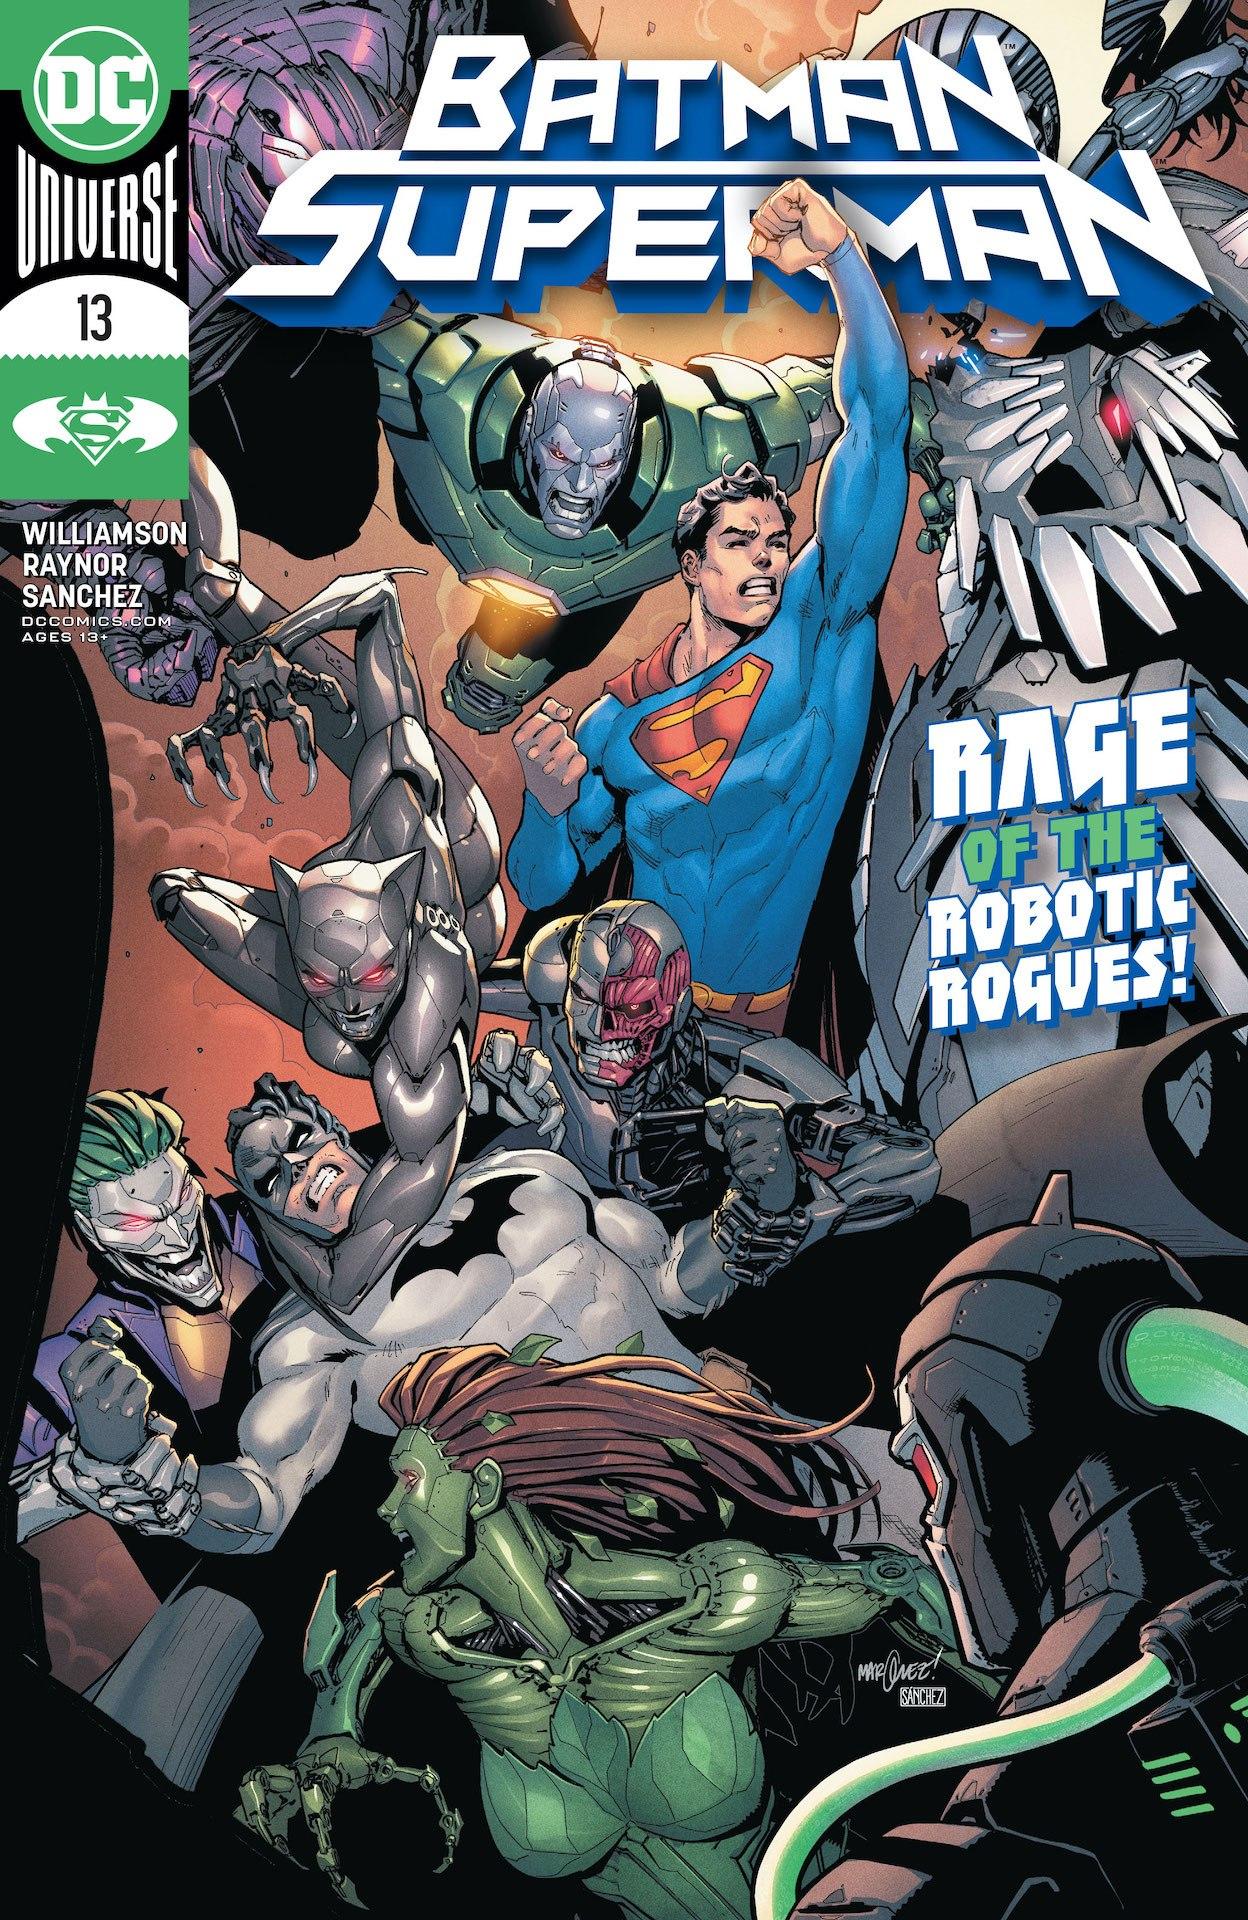 Batman/Superman #13 preview